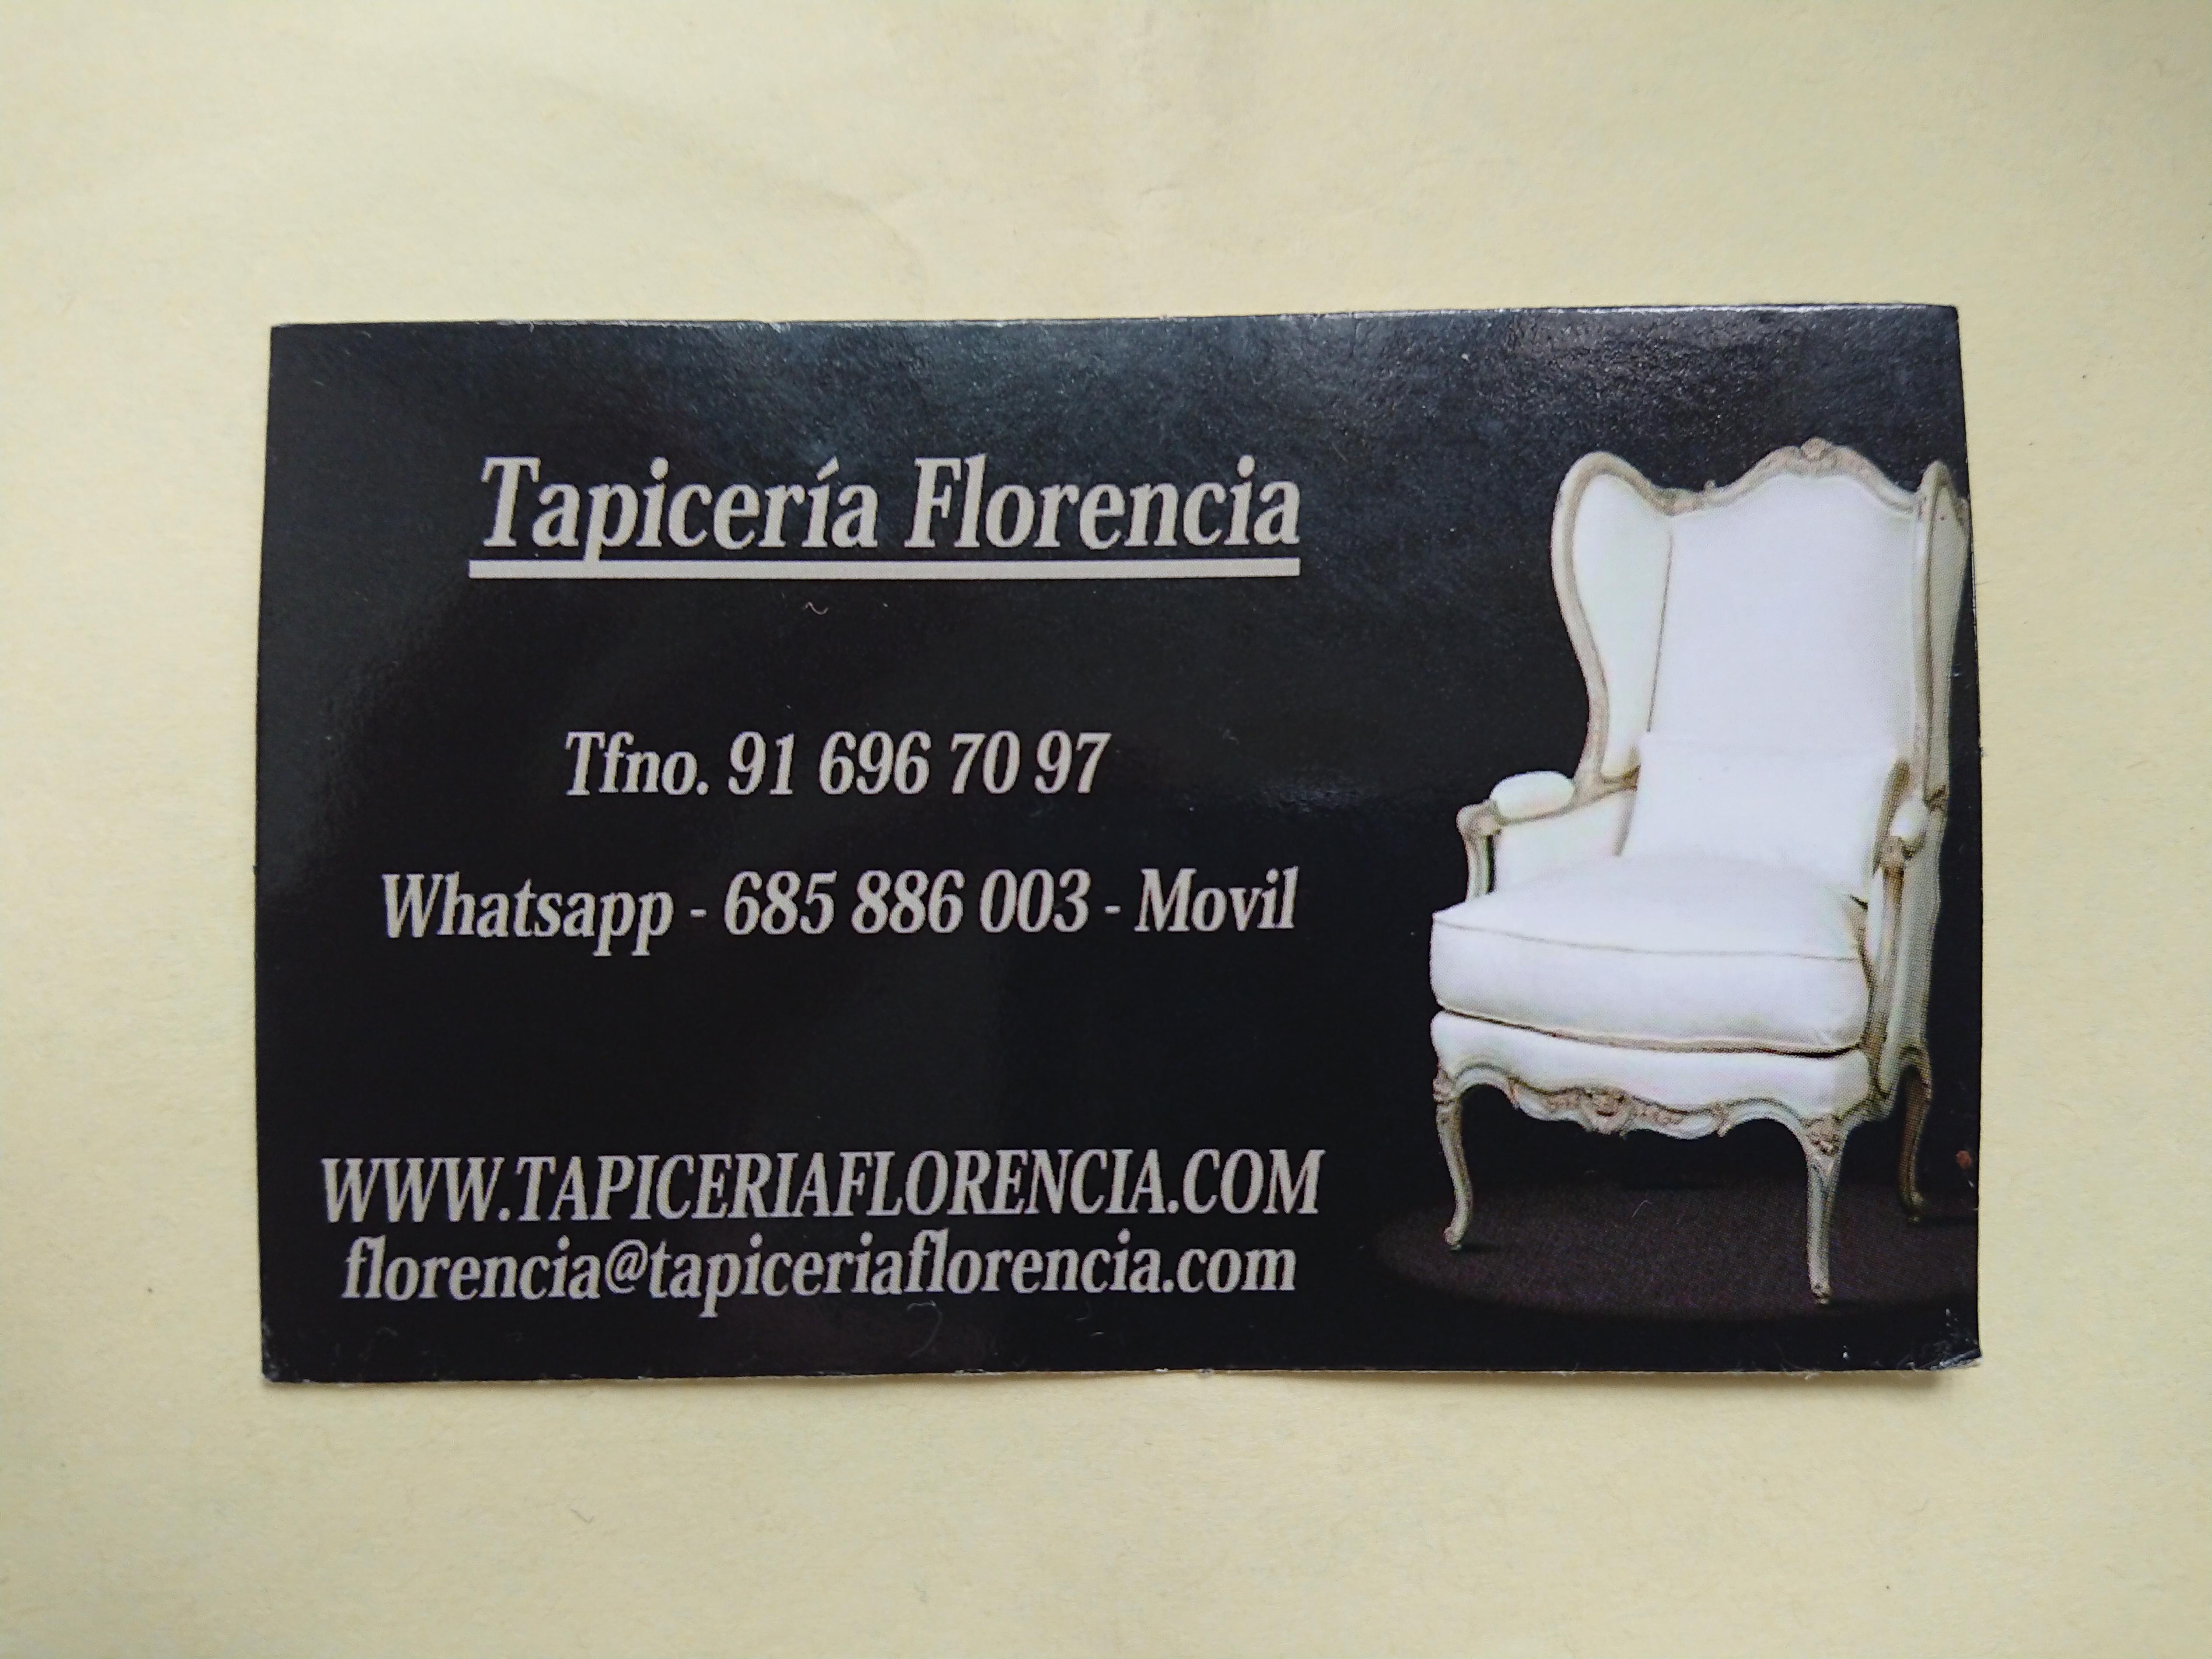 Tapiceria Florencia